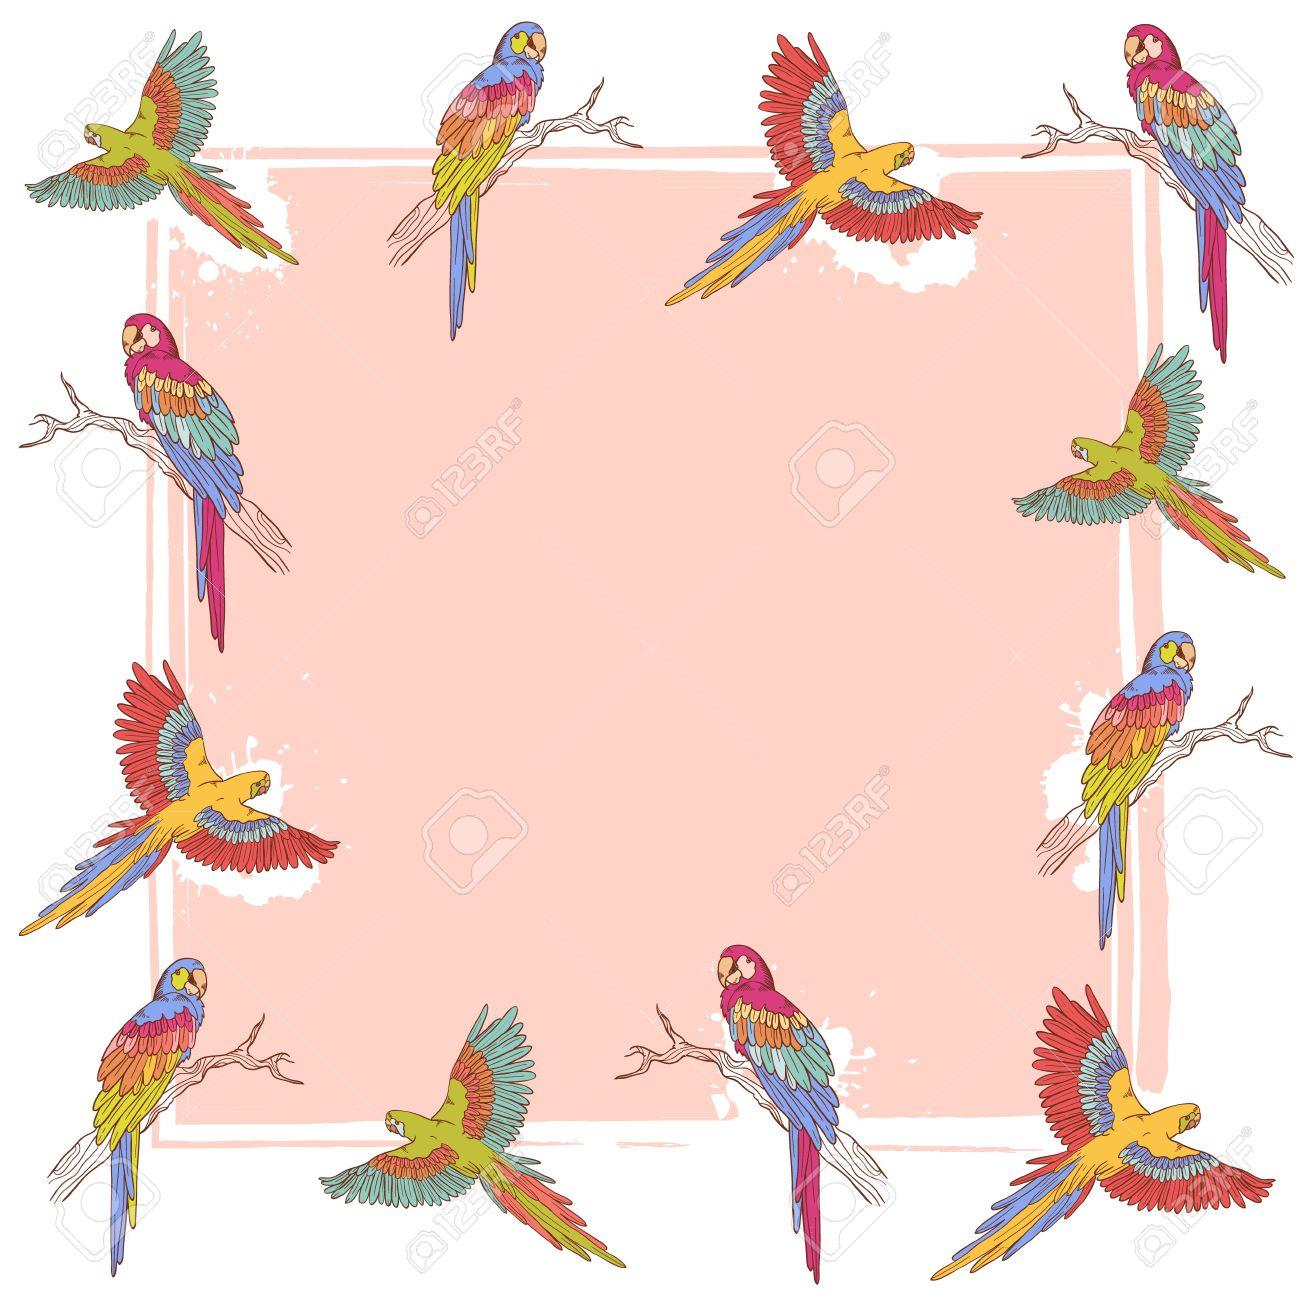 Parrot clipart border. X free clip art